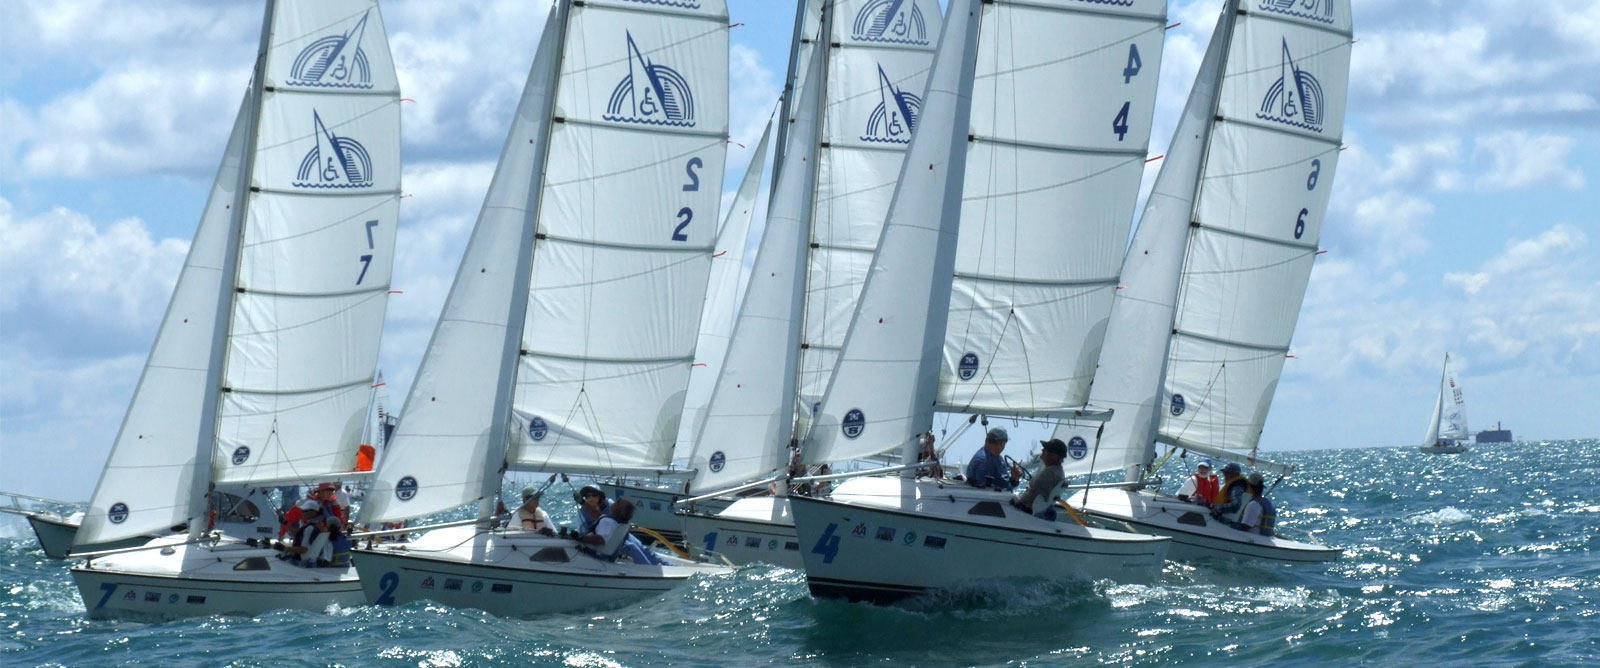 The Judd Goldman Adaptive Sailing Program